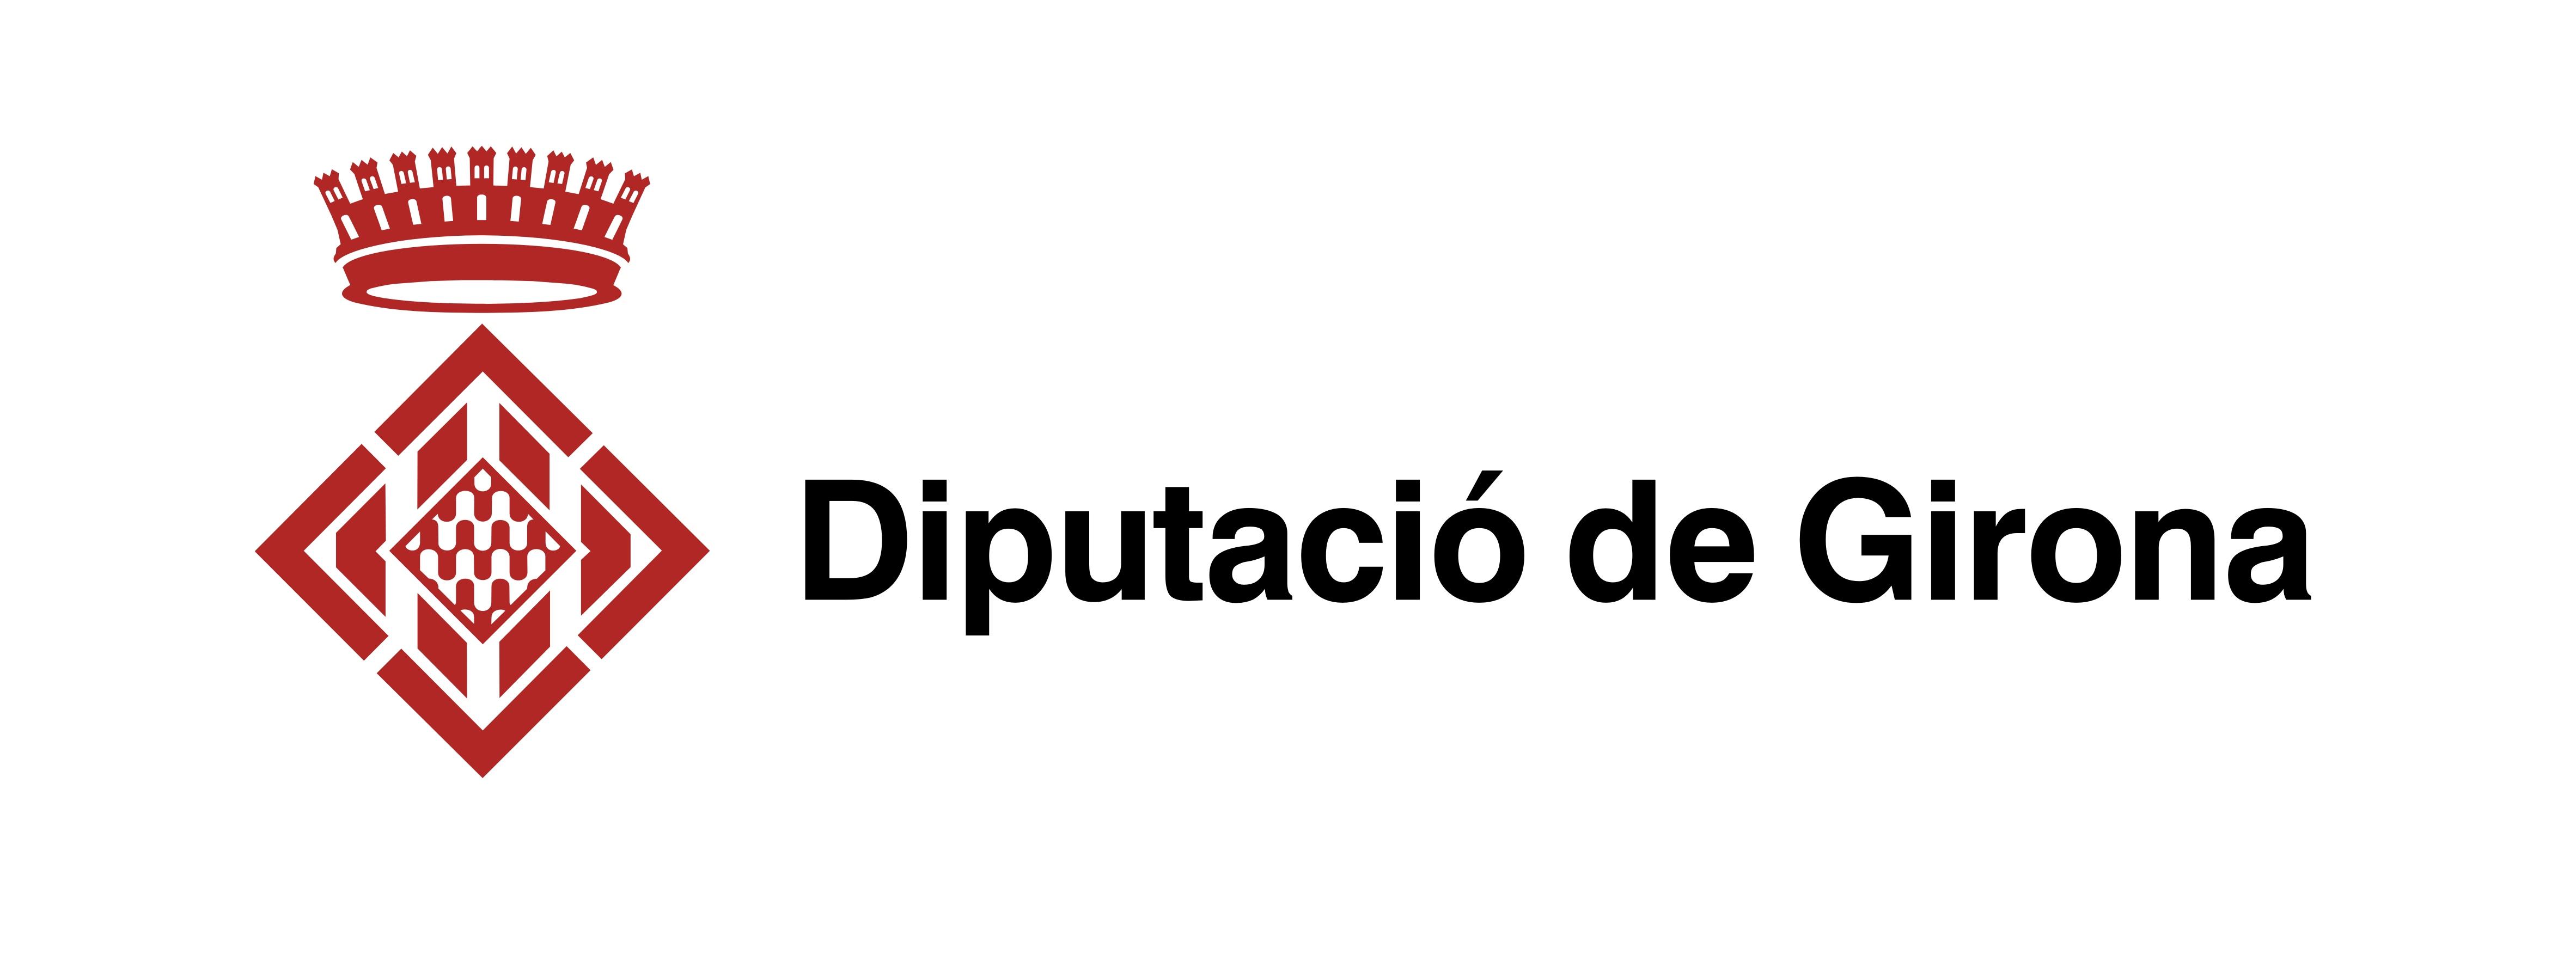 marca_diputacio_apaisada